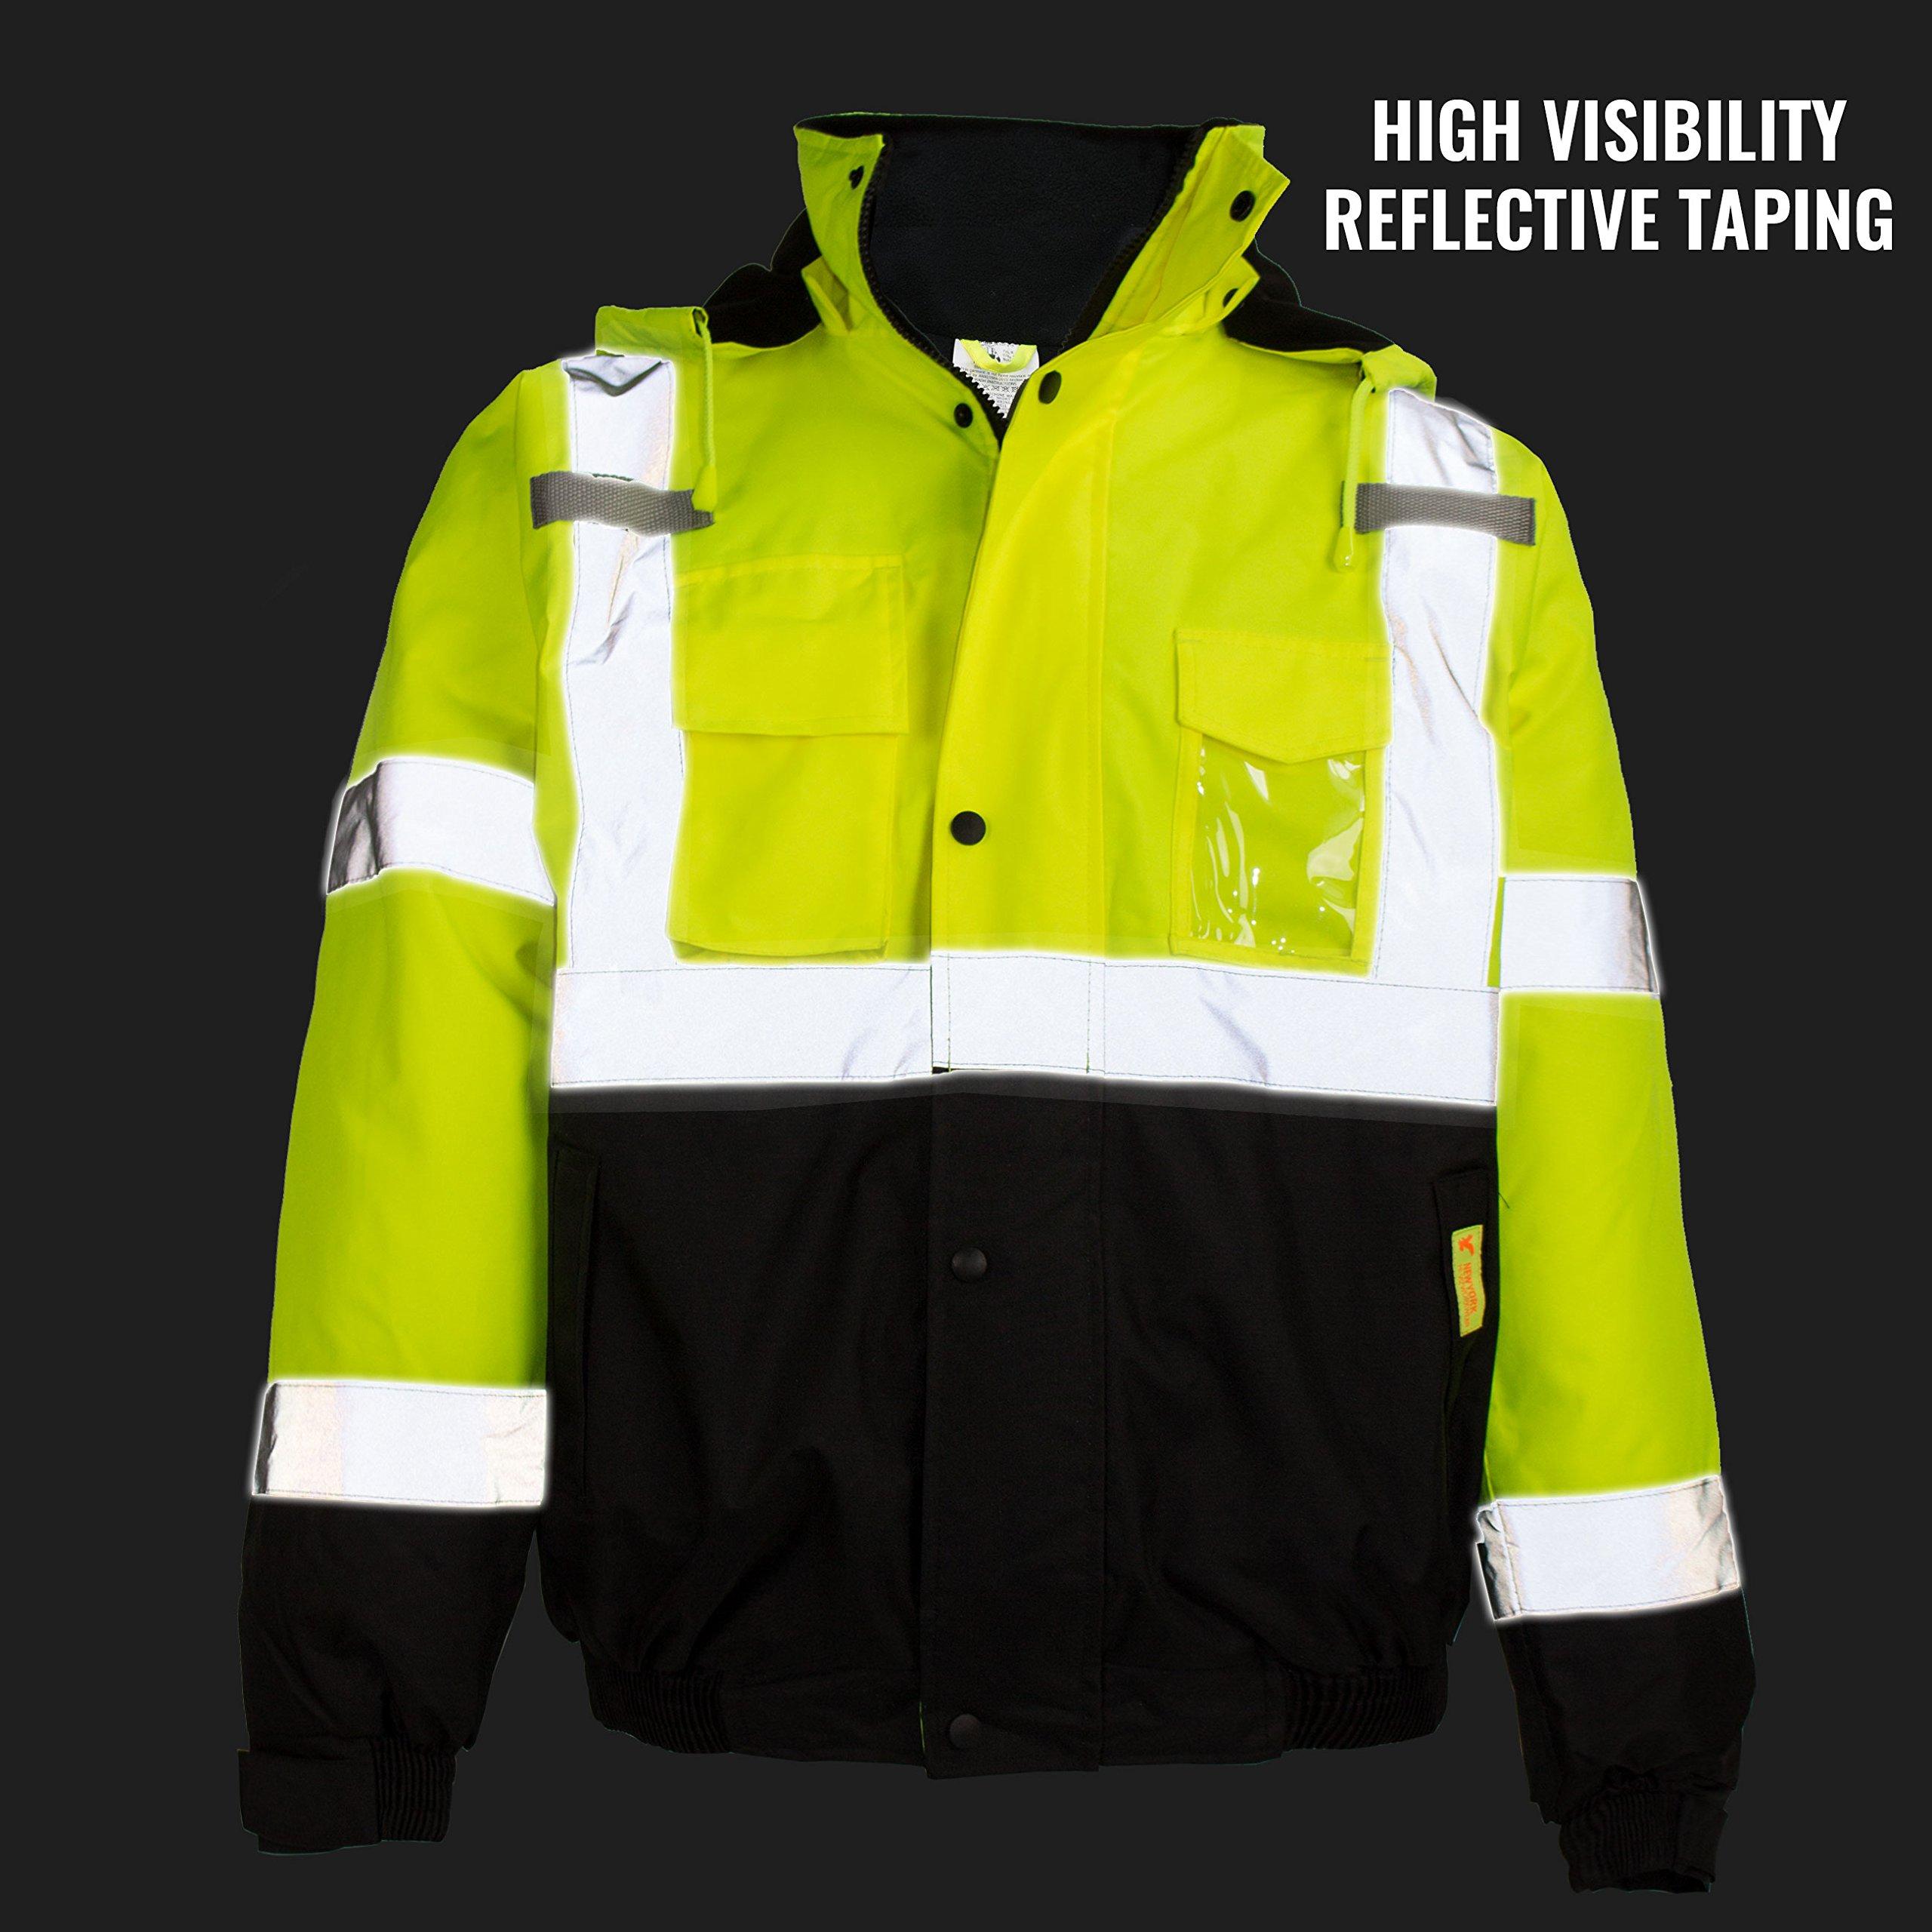 New York Hi-Viz Workwear WJ9012-L Men's ANSI Class 3 High Visibility Bomber Safety Jacket, Waterproof (Large, Lime) by New York Hi-Viz Workwear (Image #7)